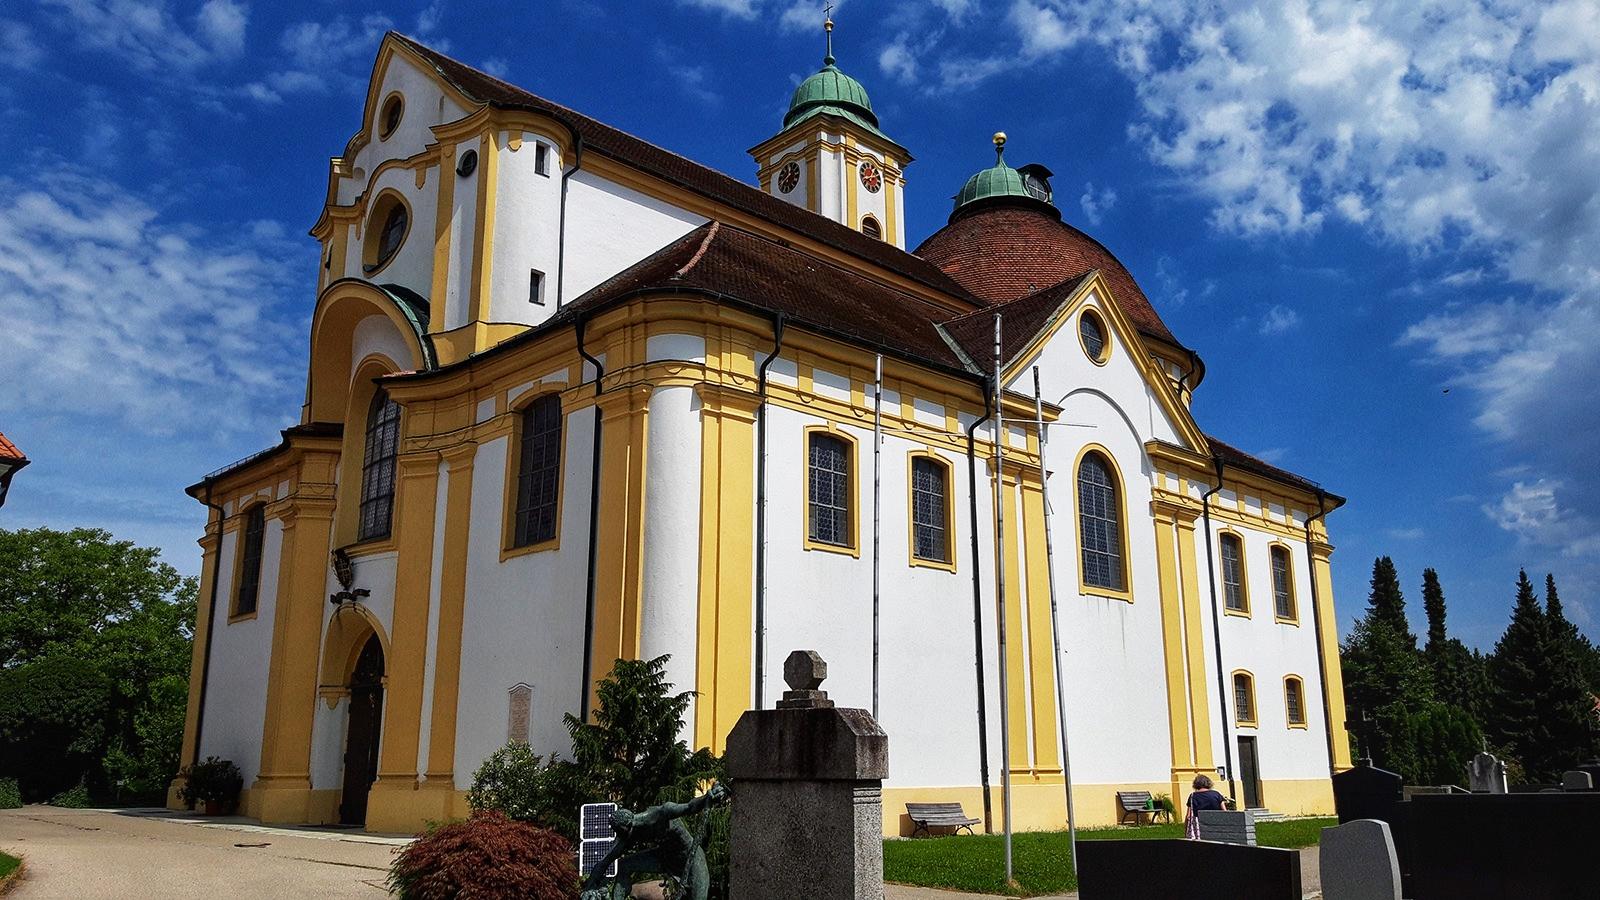 Wallfahrtskirche Herrgottsruh in Friedberg